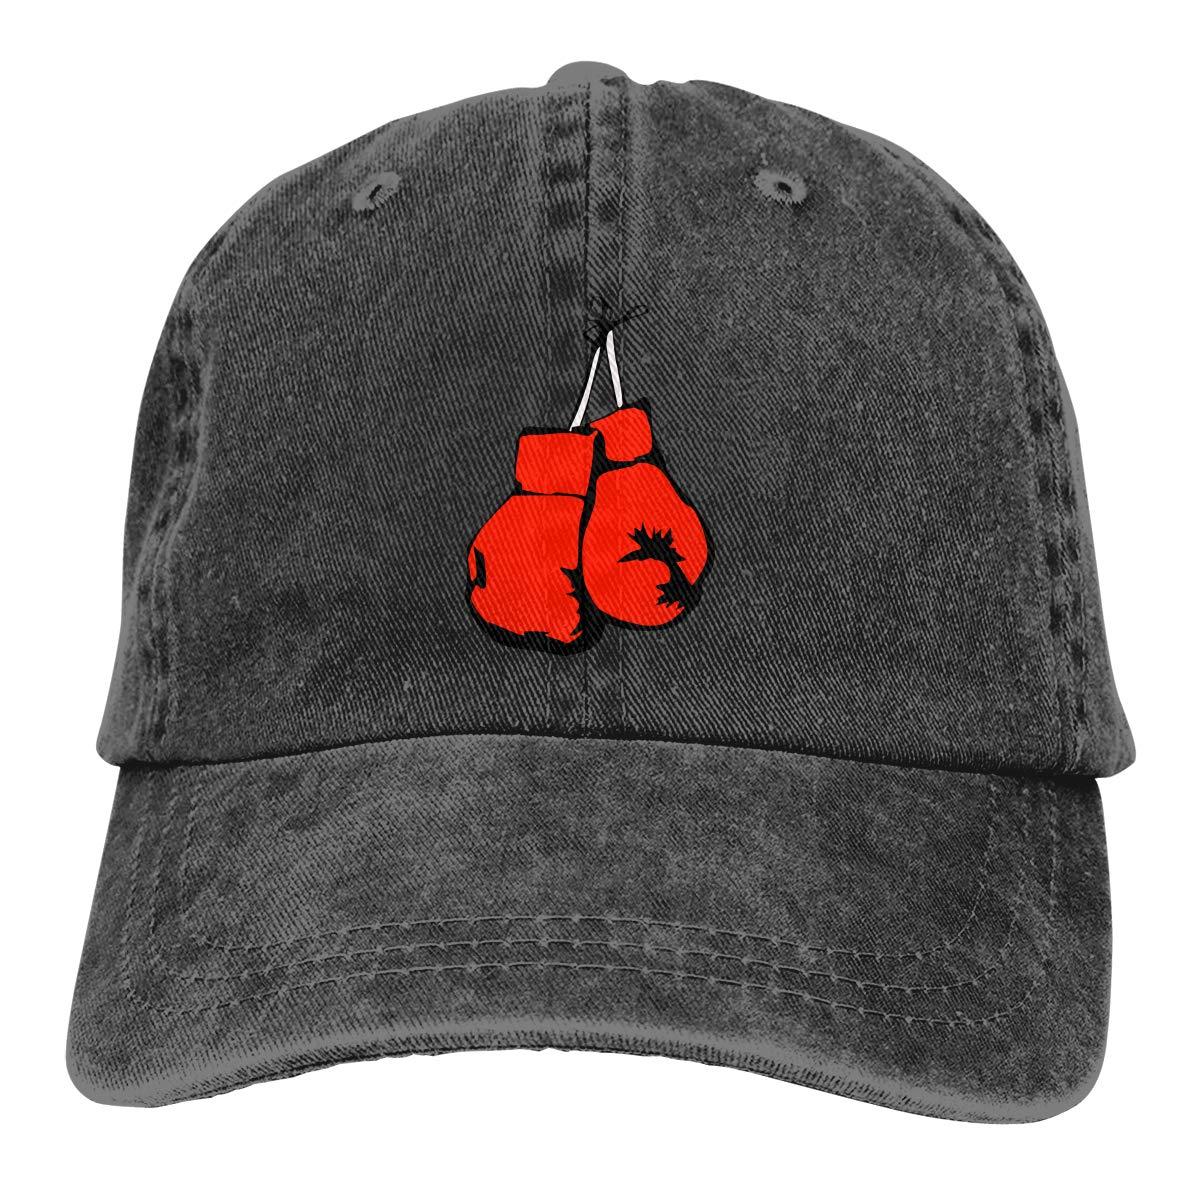 Qbeir Adult Unisex Cowboy Cap Adjustable Hat Boxing Fight Cotton Denim